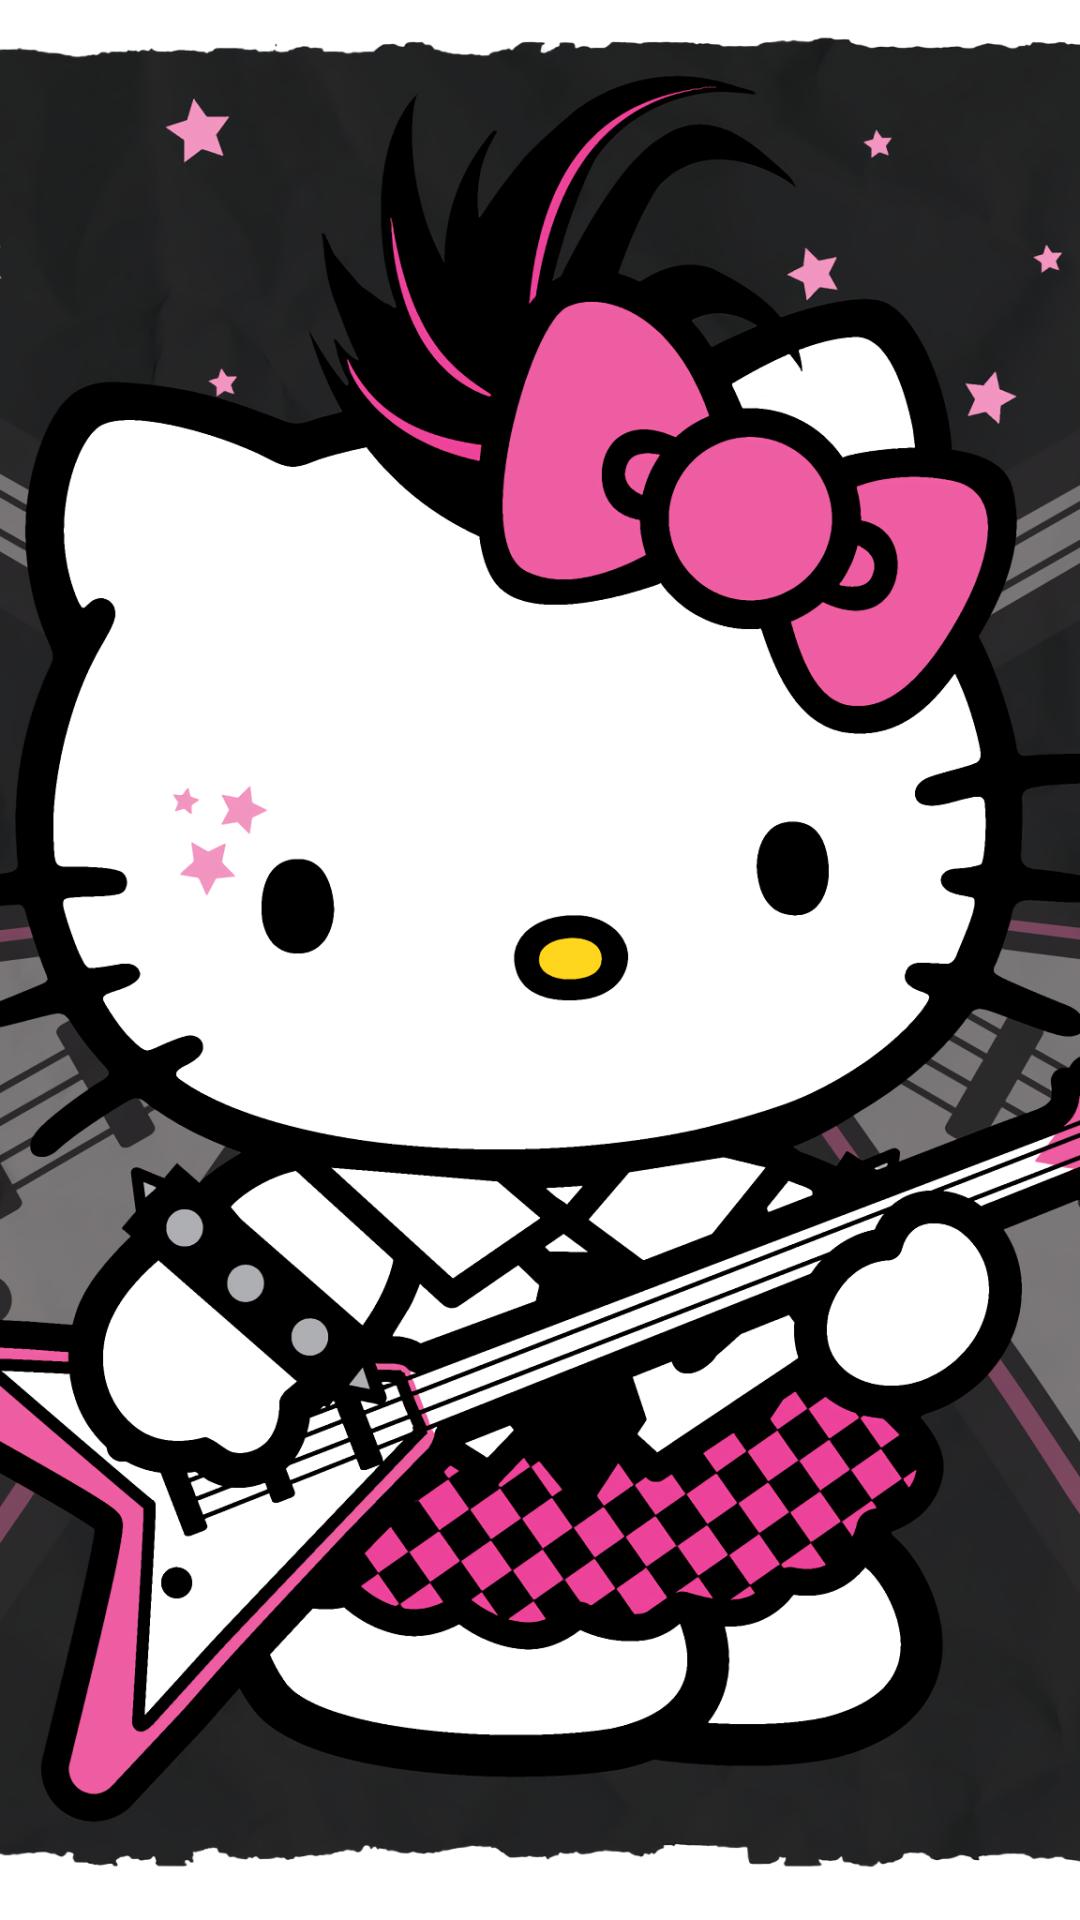 Anime Hello Kitty 1080x1920 Wallpaper ID Mobile